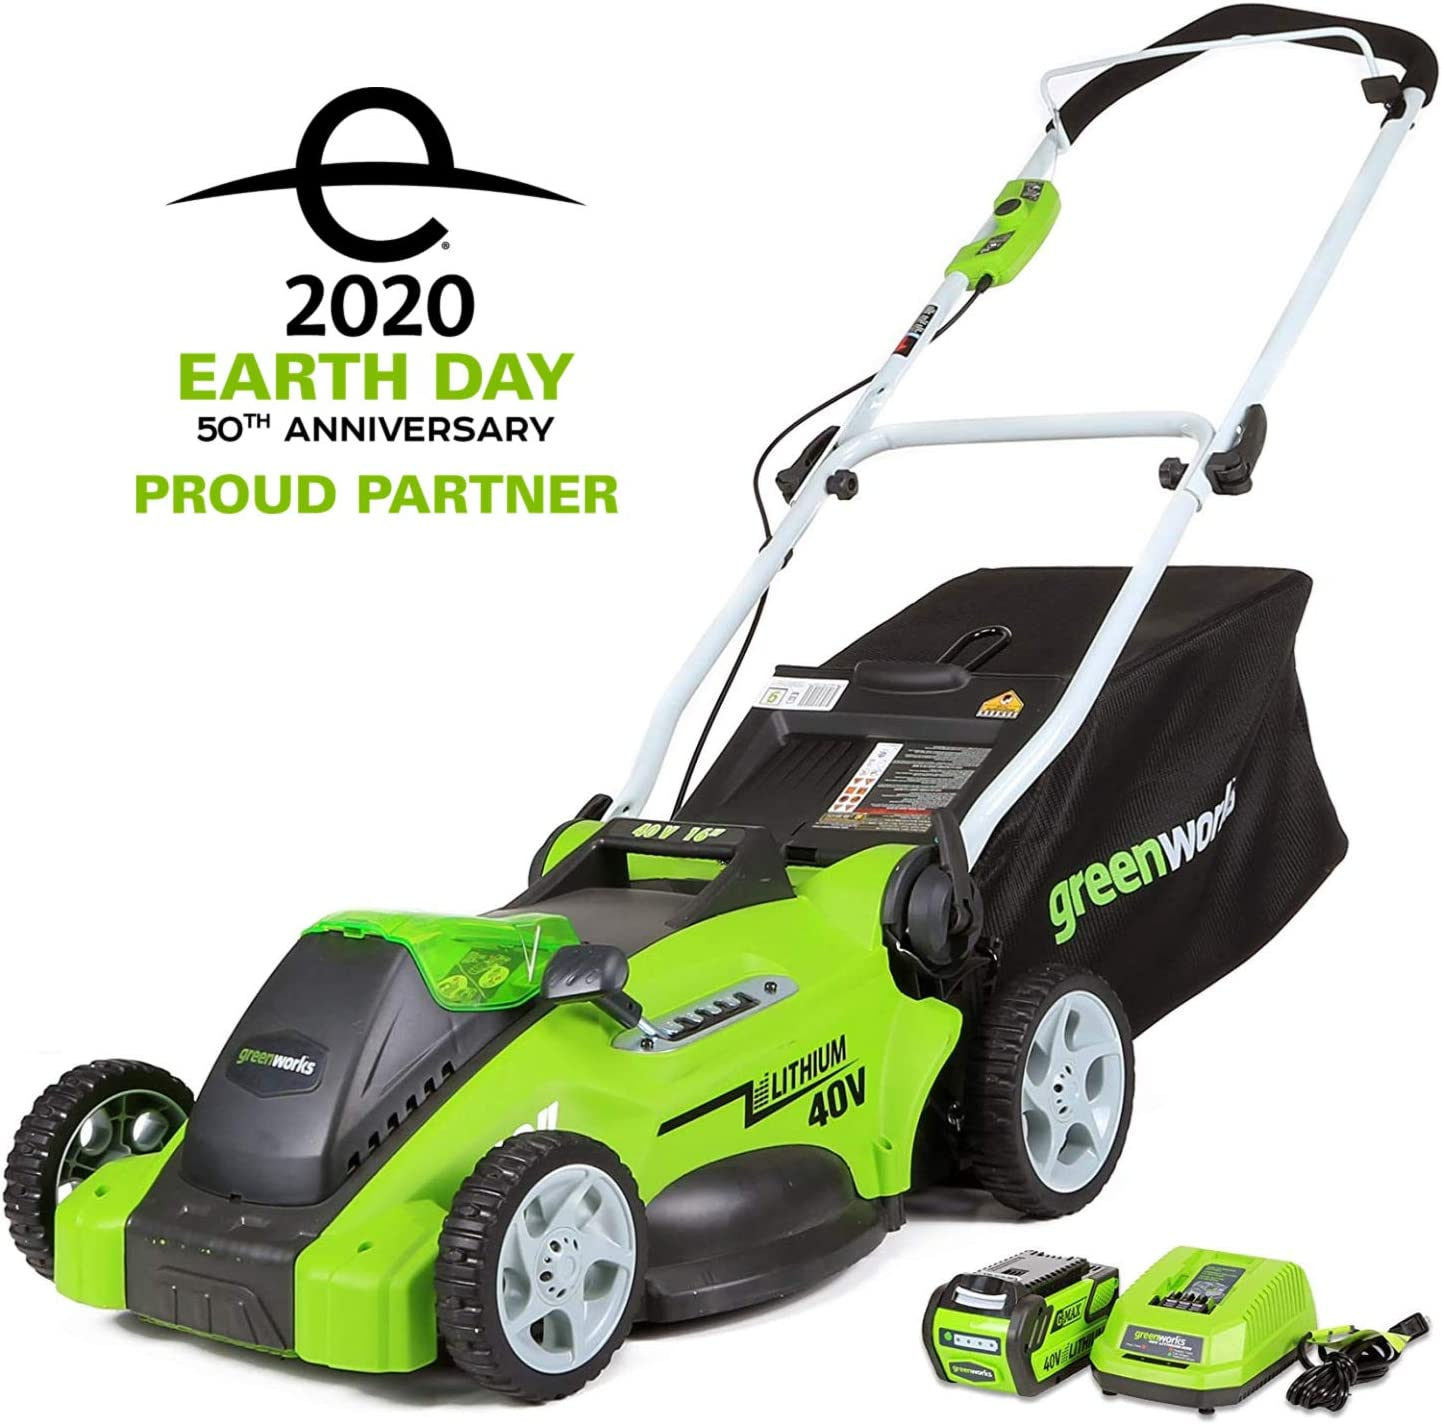 Greenworks 16-Inch 40V Best Battery Lawn Mower